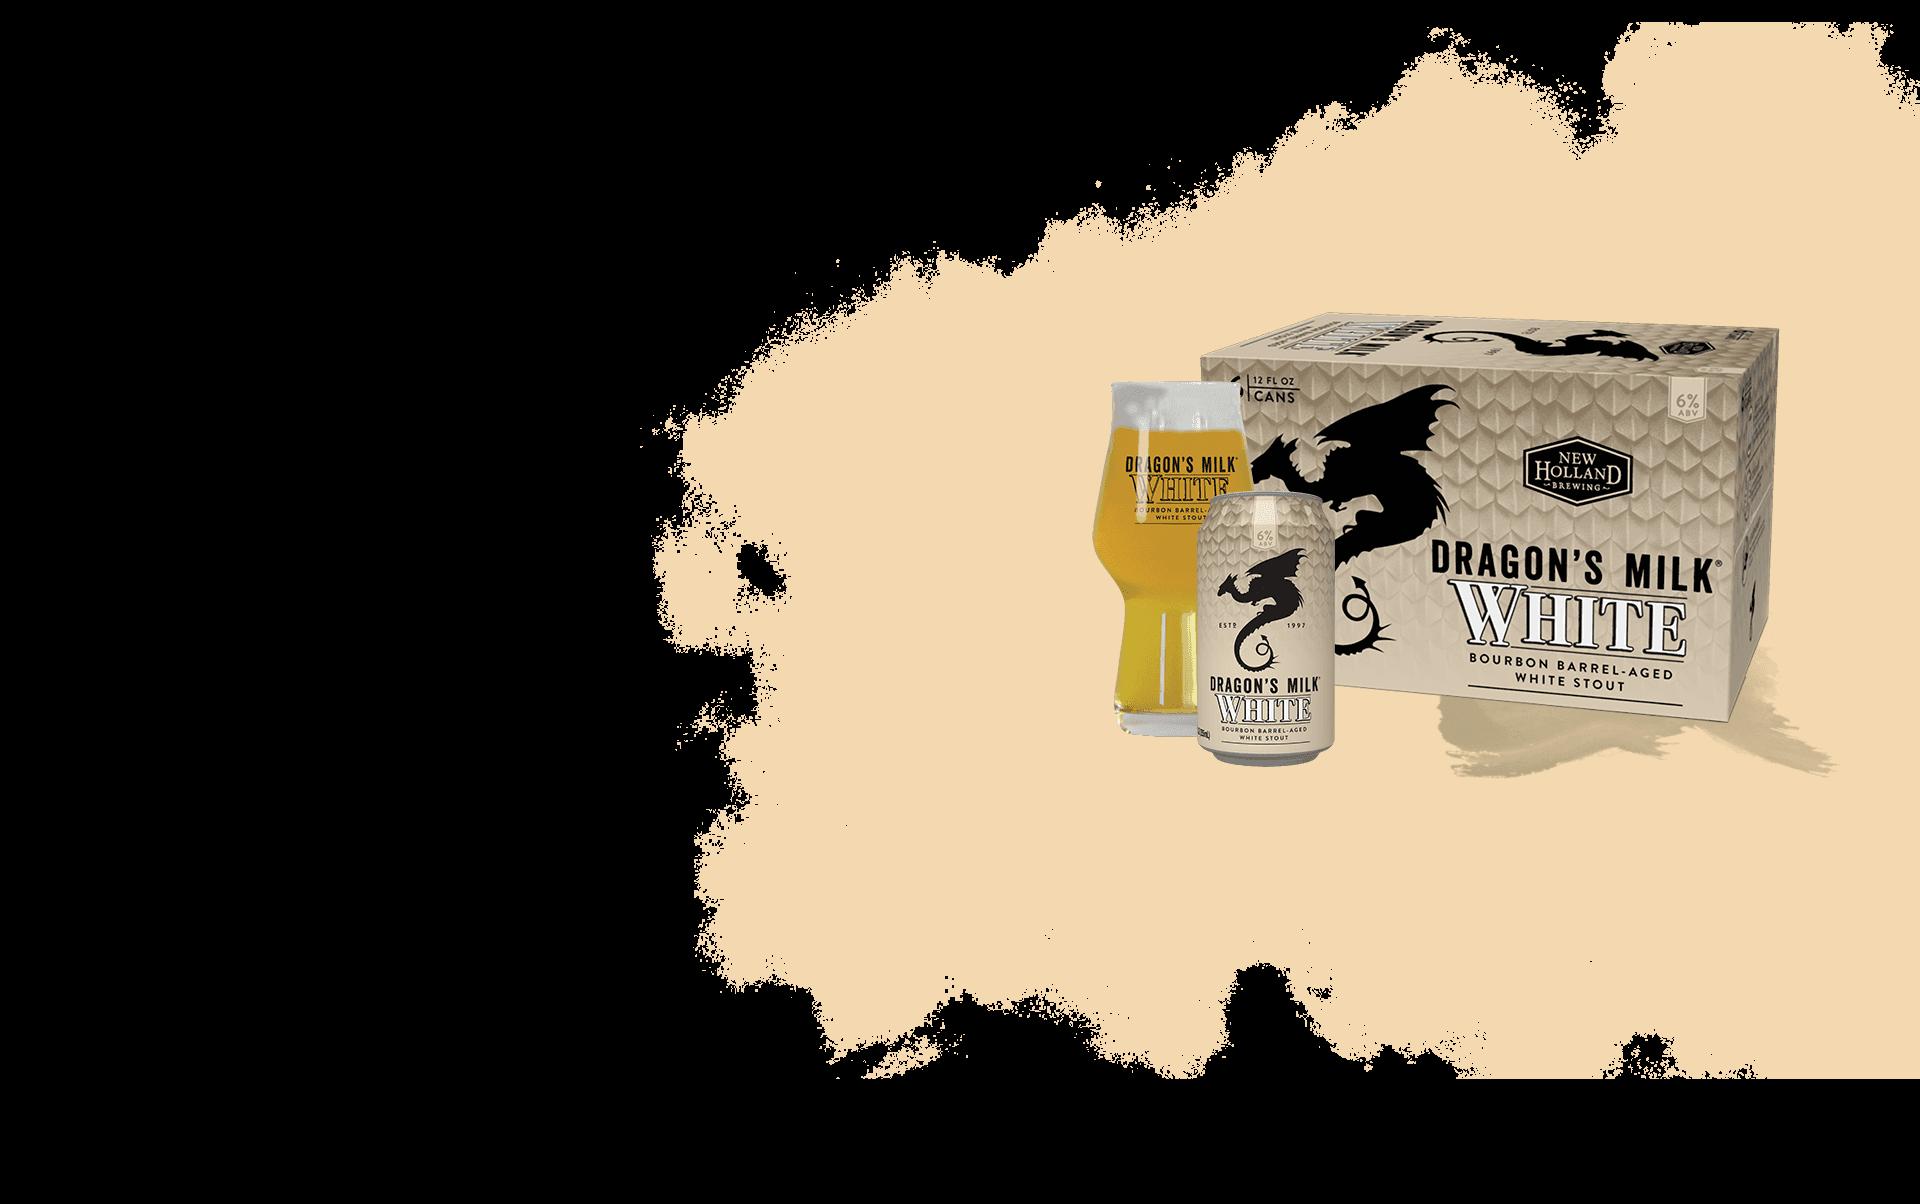 Dragon's Milk White Header